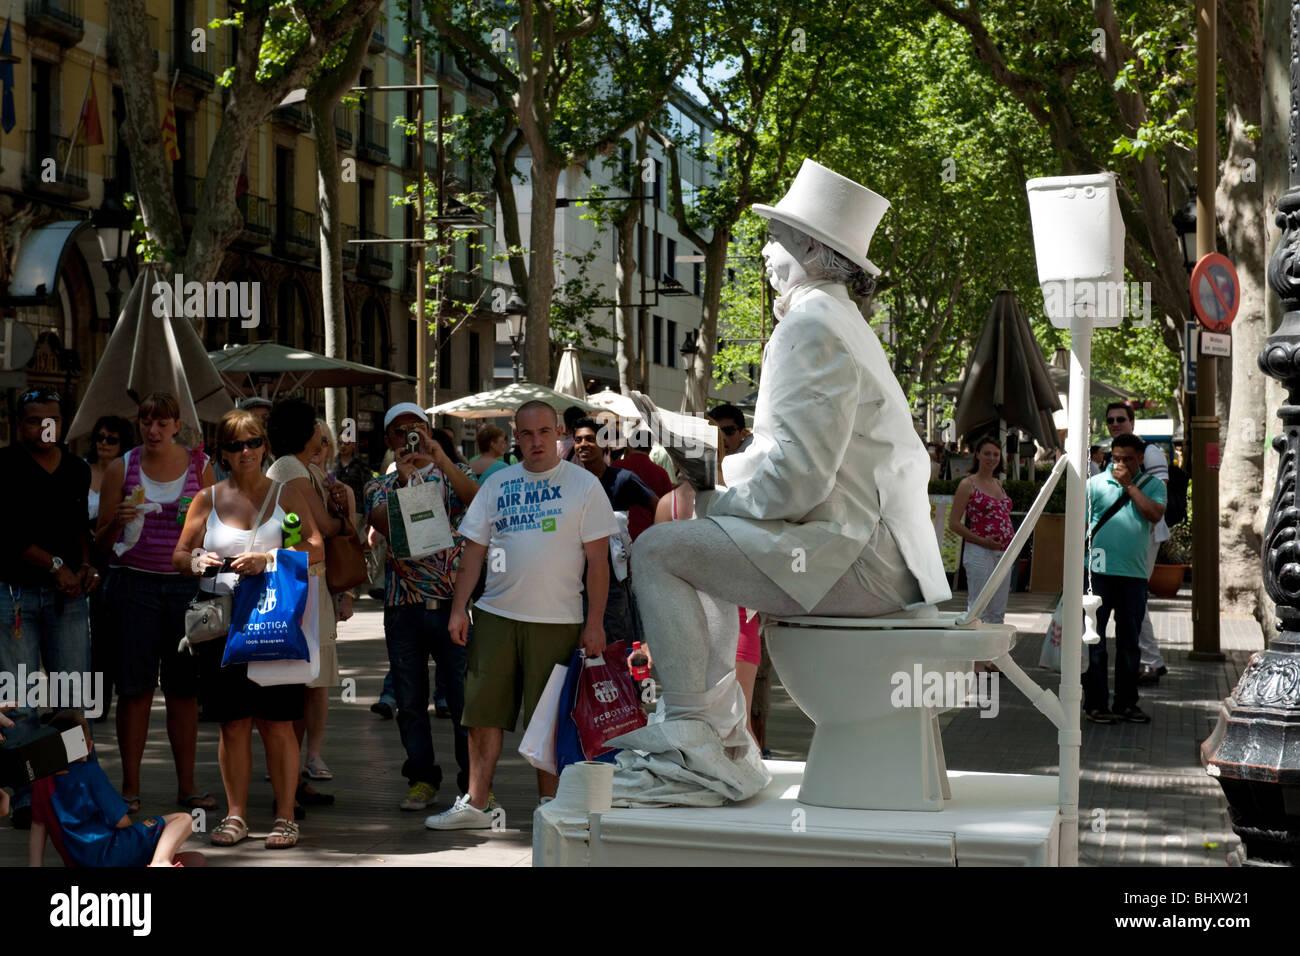 Auf der Rambla, Barcelona, Mai 2009, Spanien#On the Rambla, Barcelona, May 2009, Spain - Stock Image